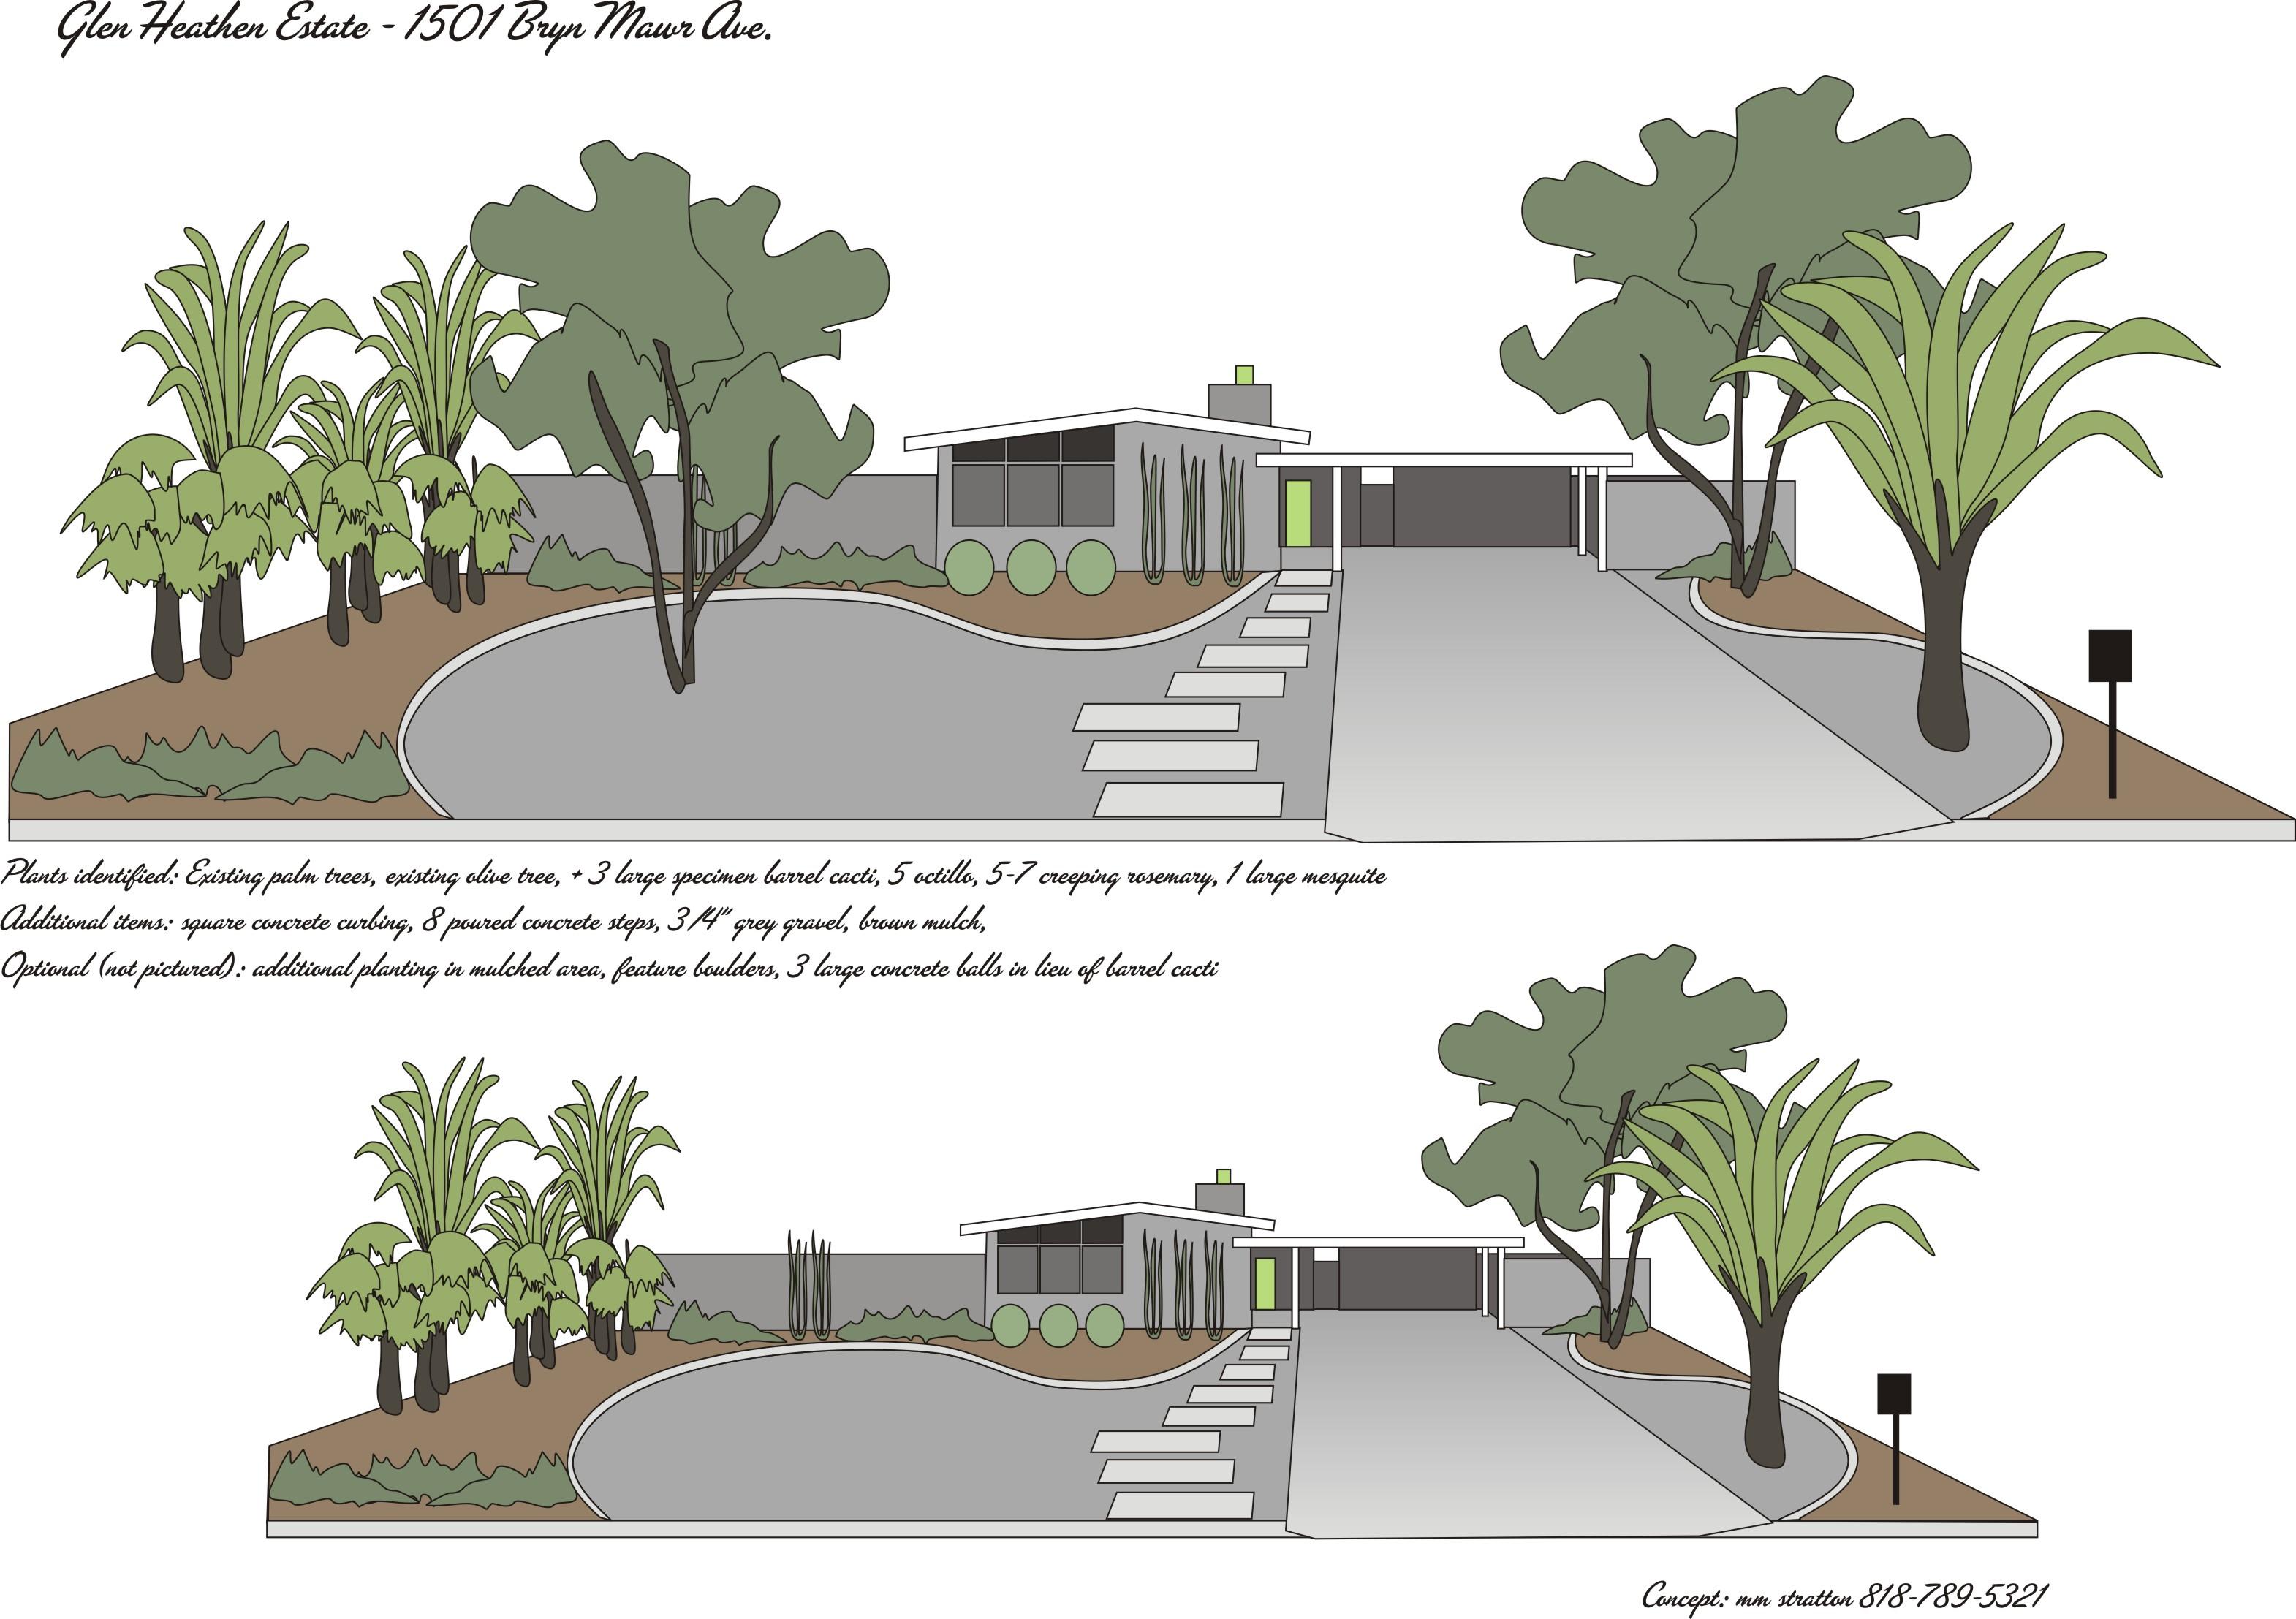 glen heathen estate u2013 landscape plans